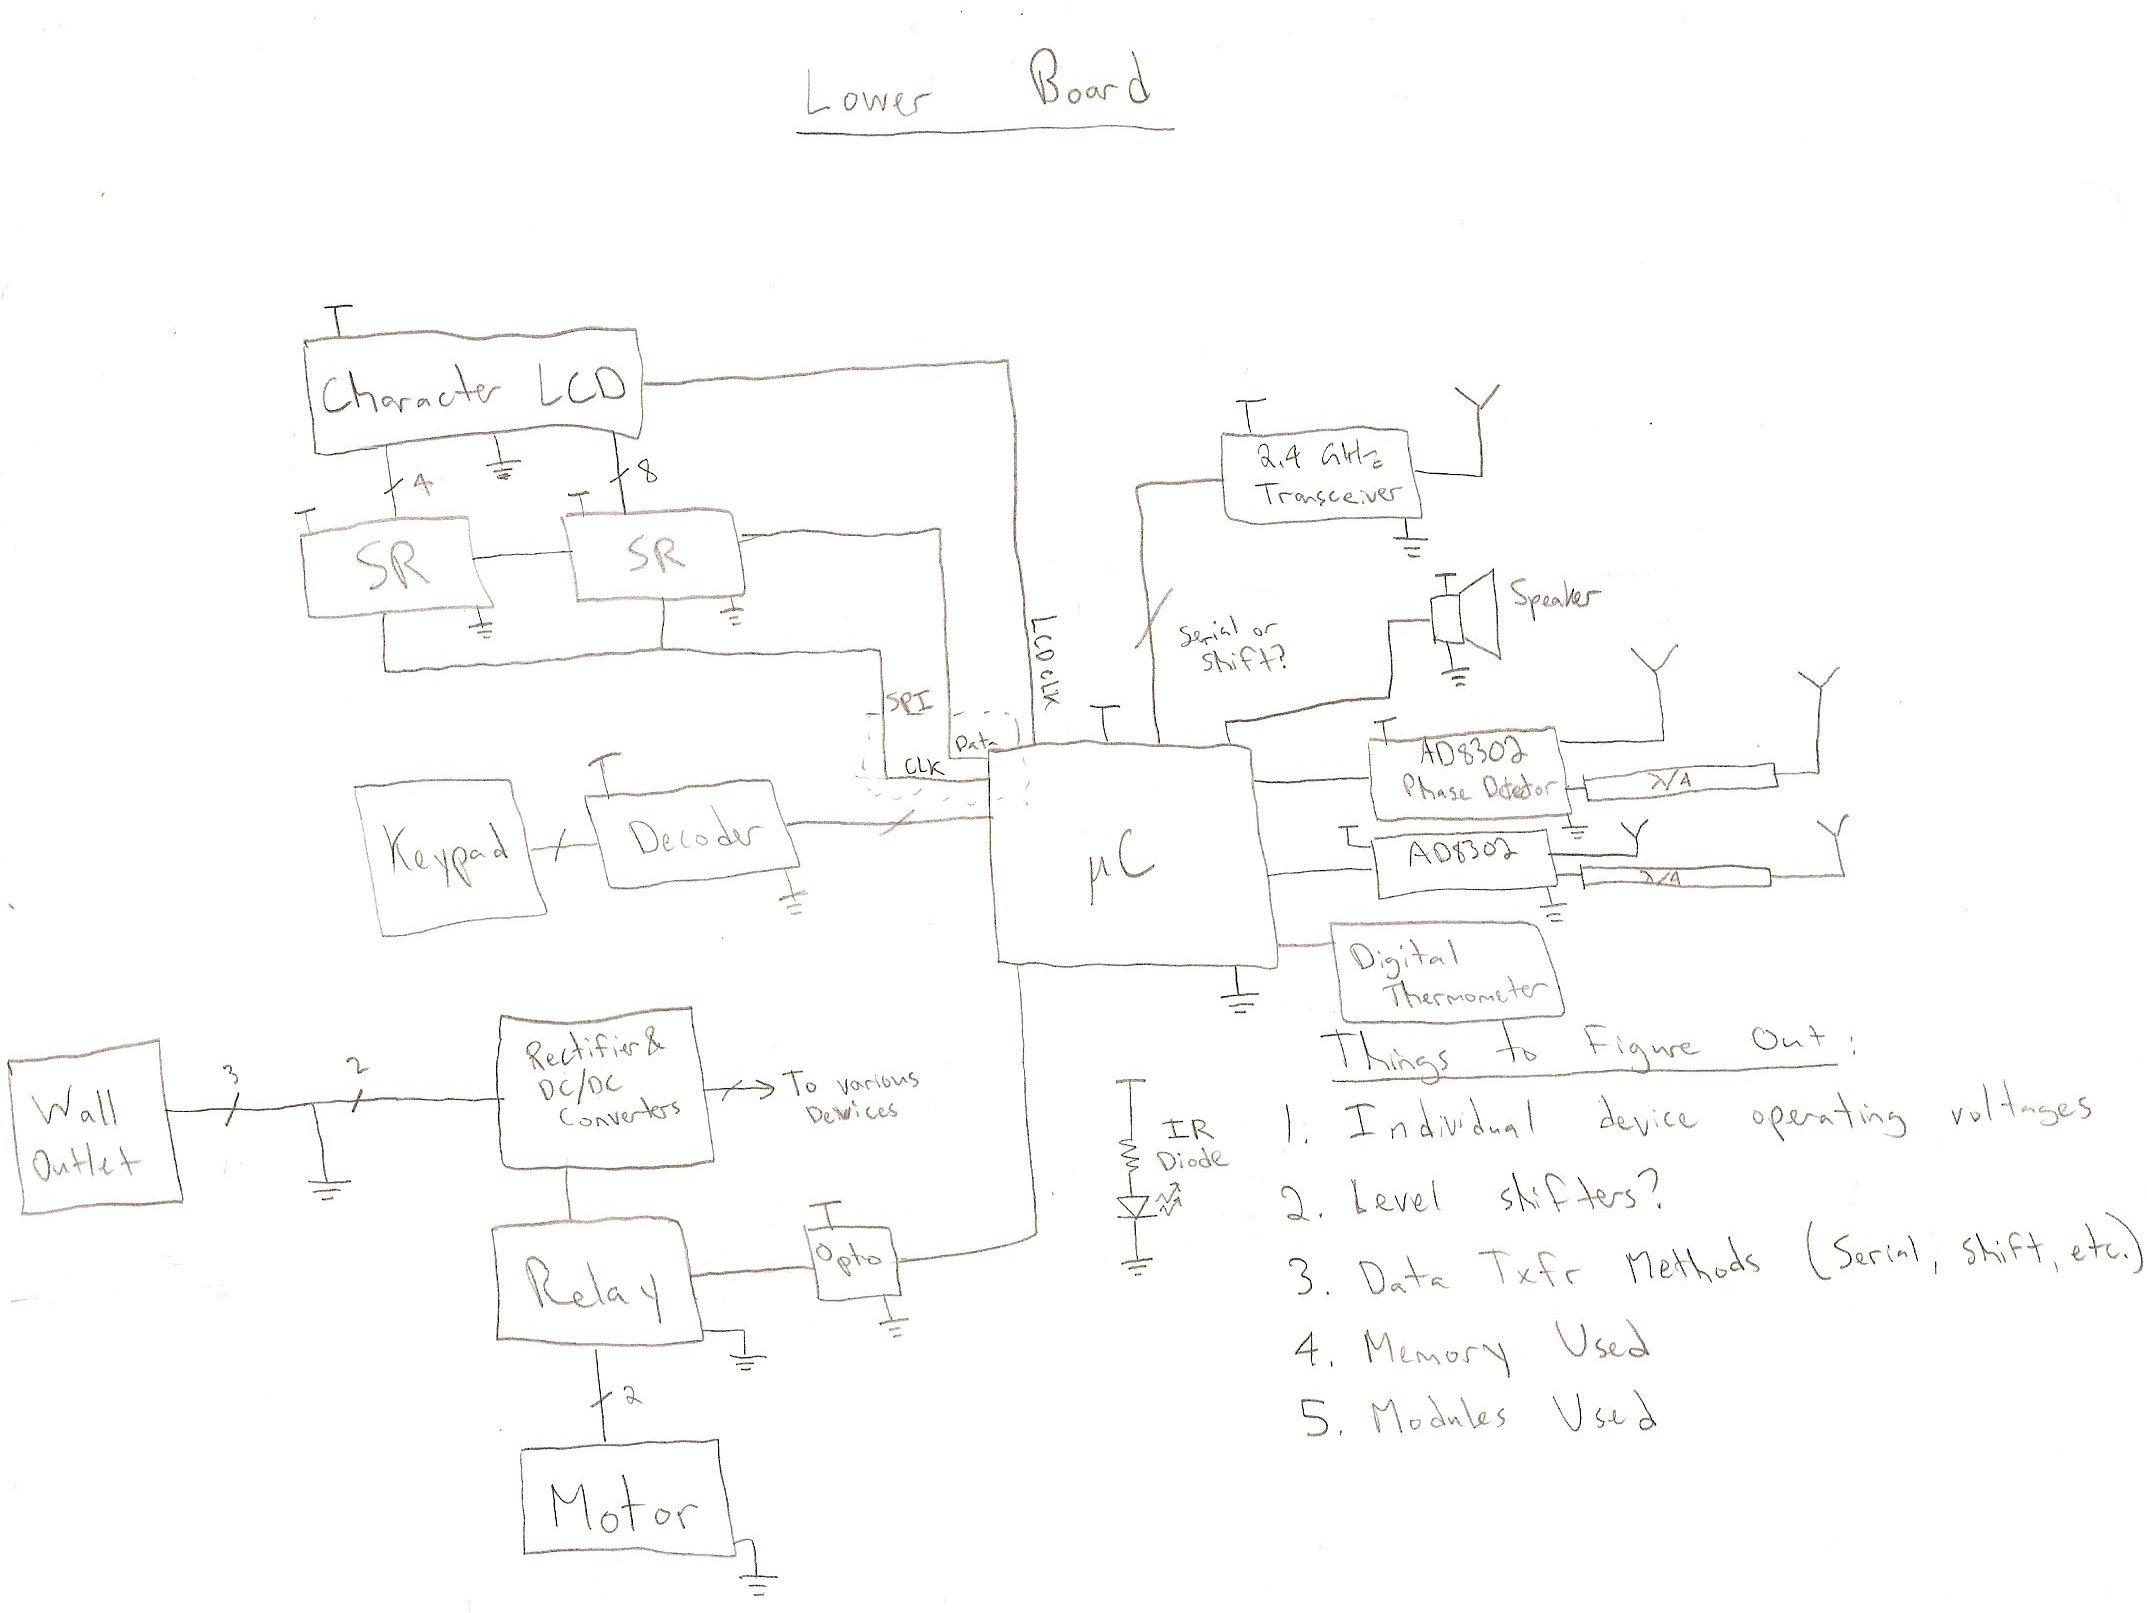 russell willmot u0026 39 s lab notebook